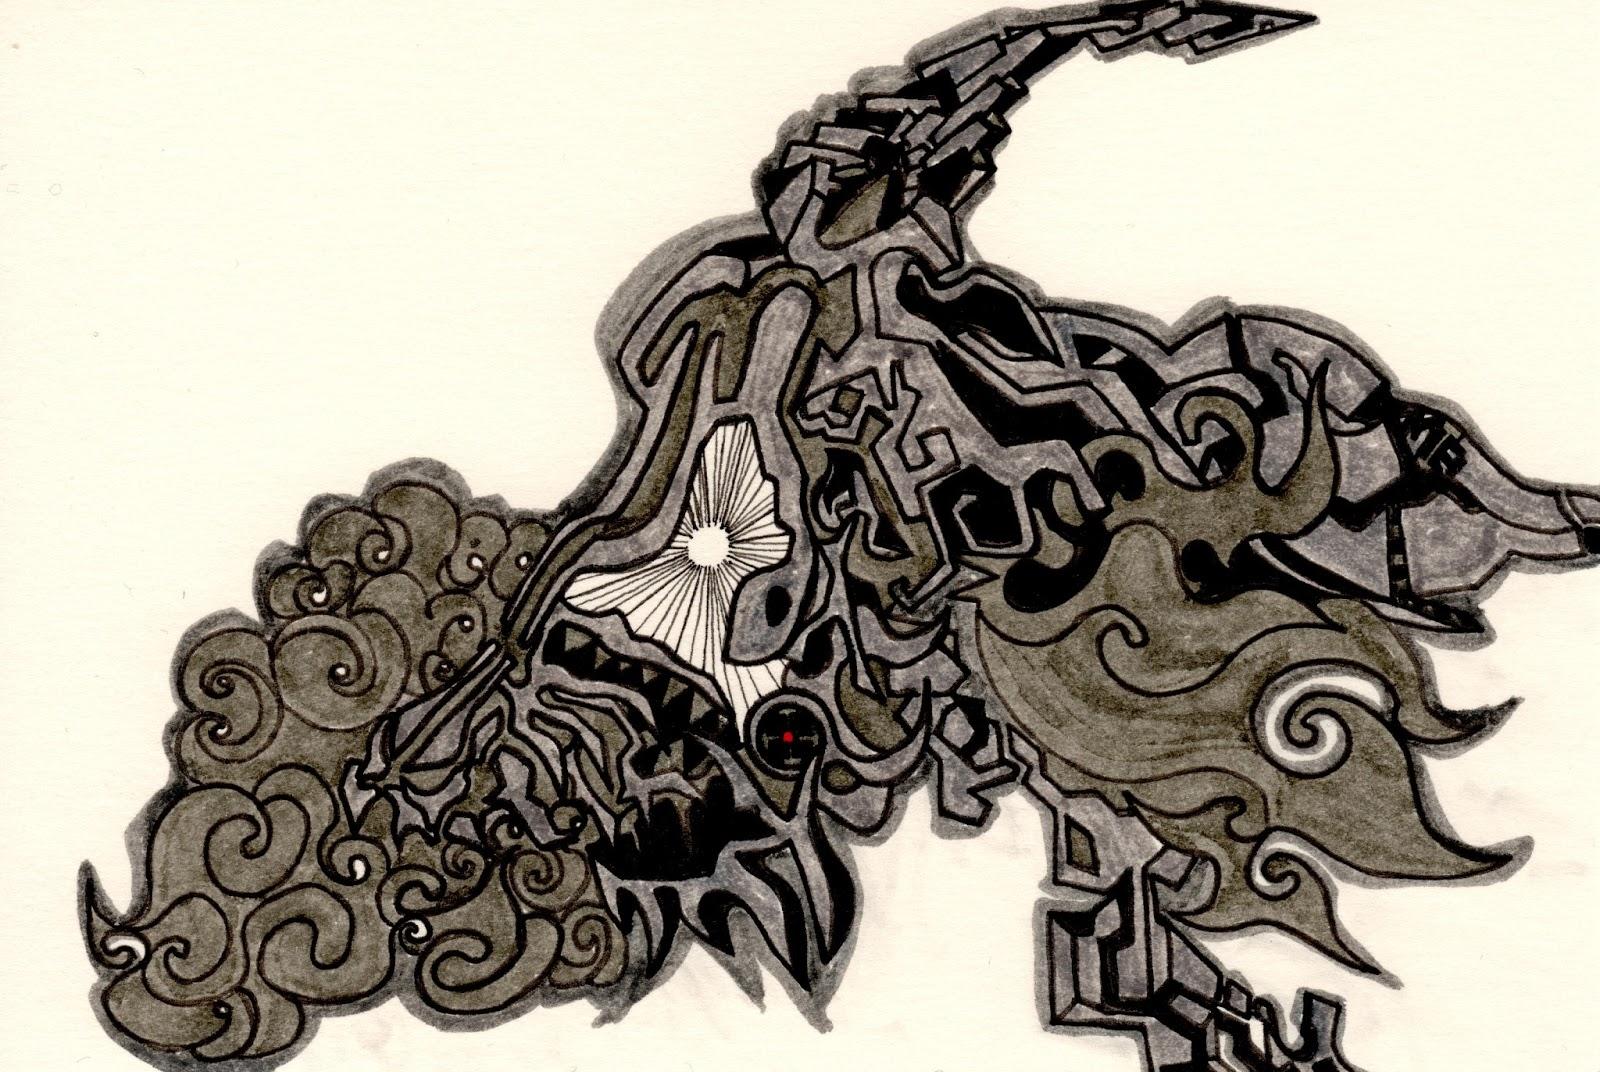 Bone of the head of the Unicorn